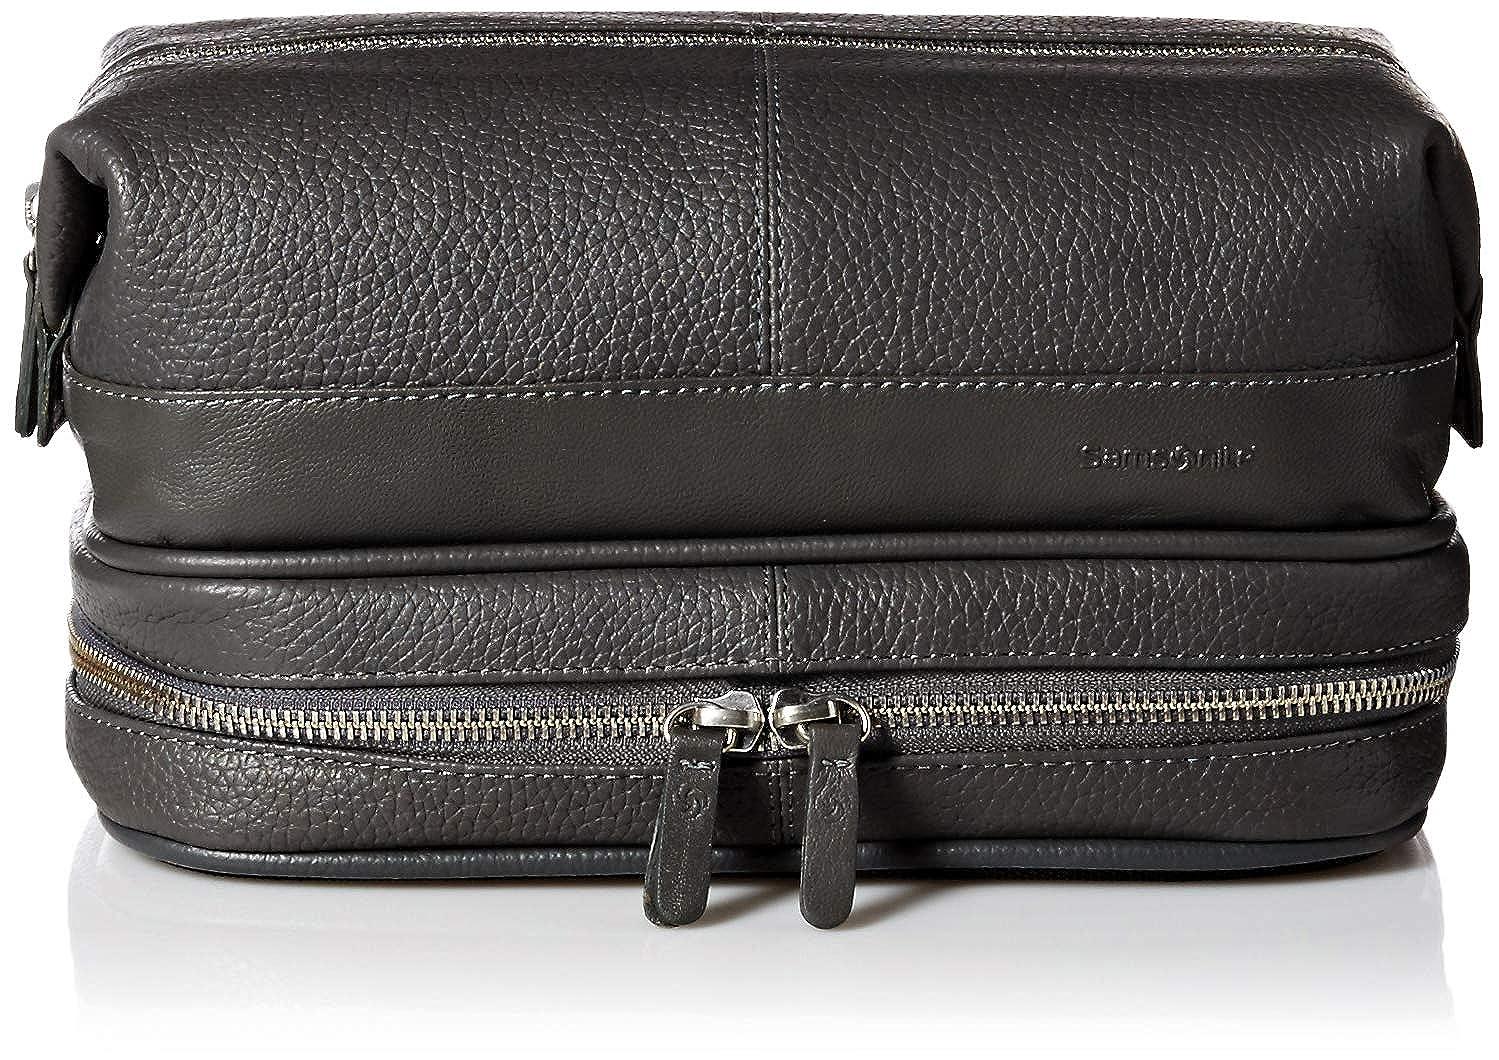 Samsonite- Leather Travel Accessories APPAREL ユニセックスアダルト B07DVPHPMD ブラック